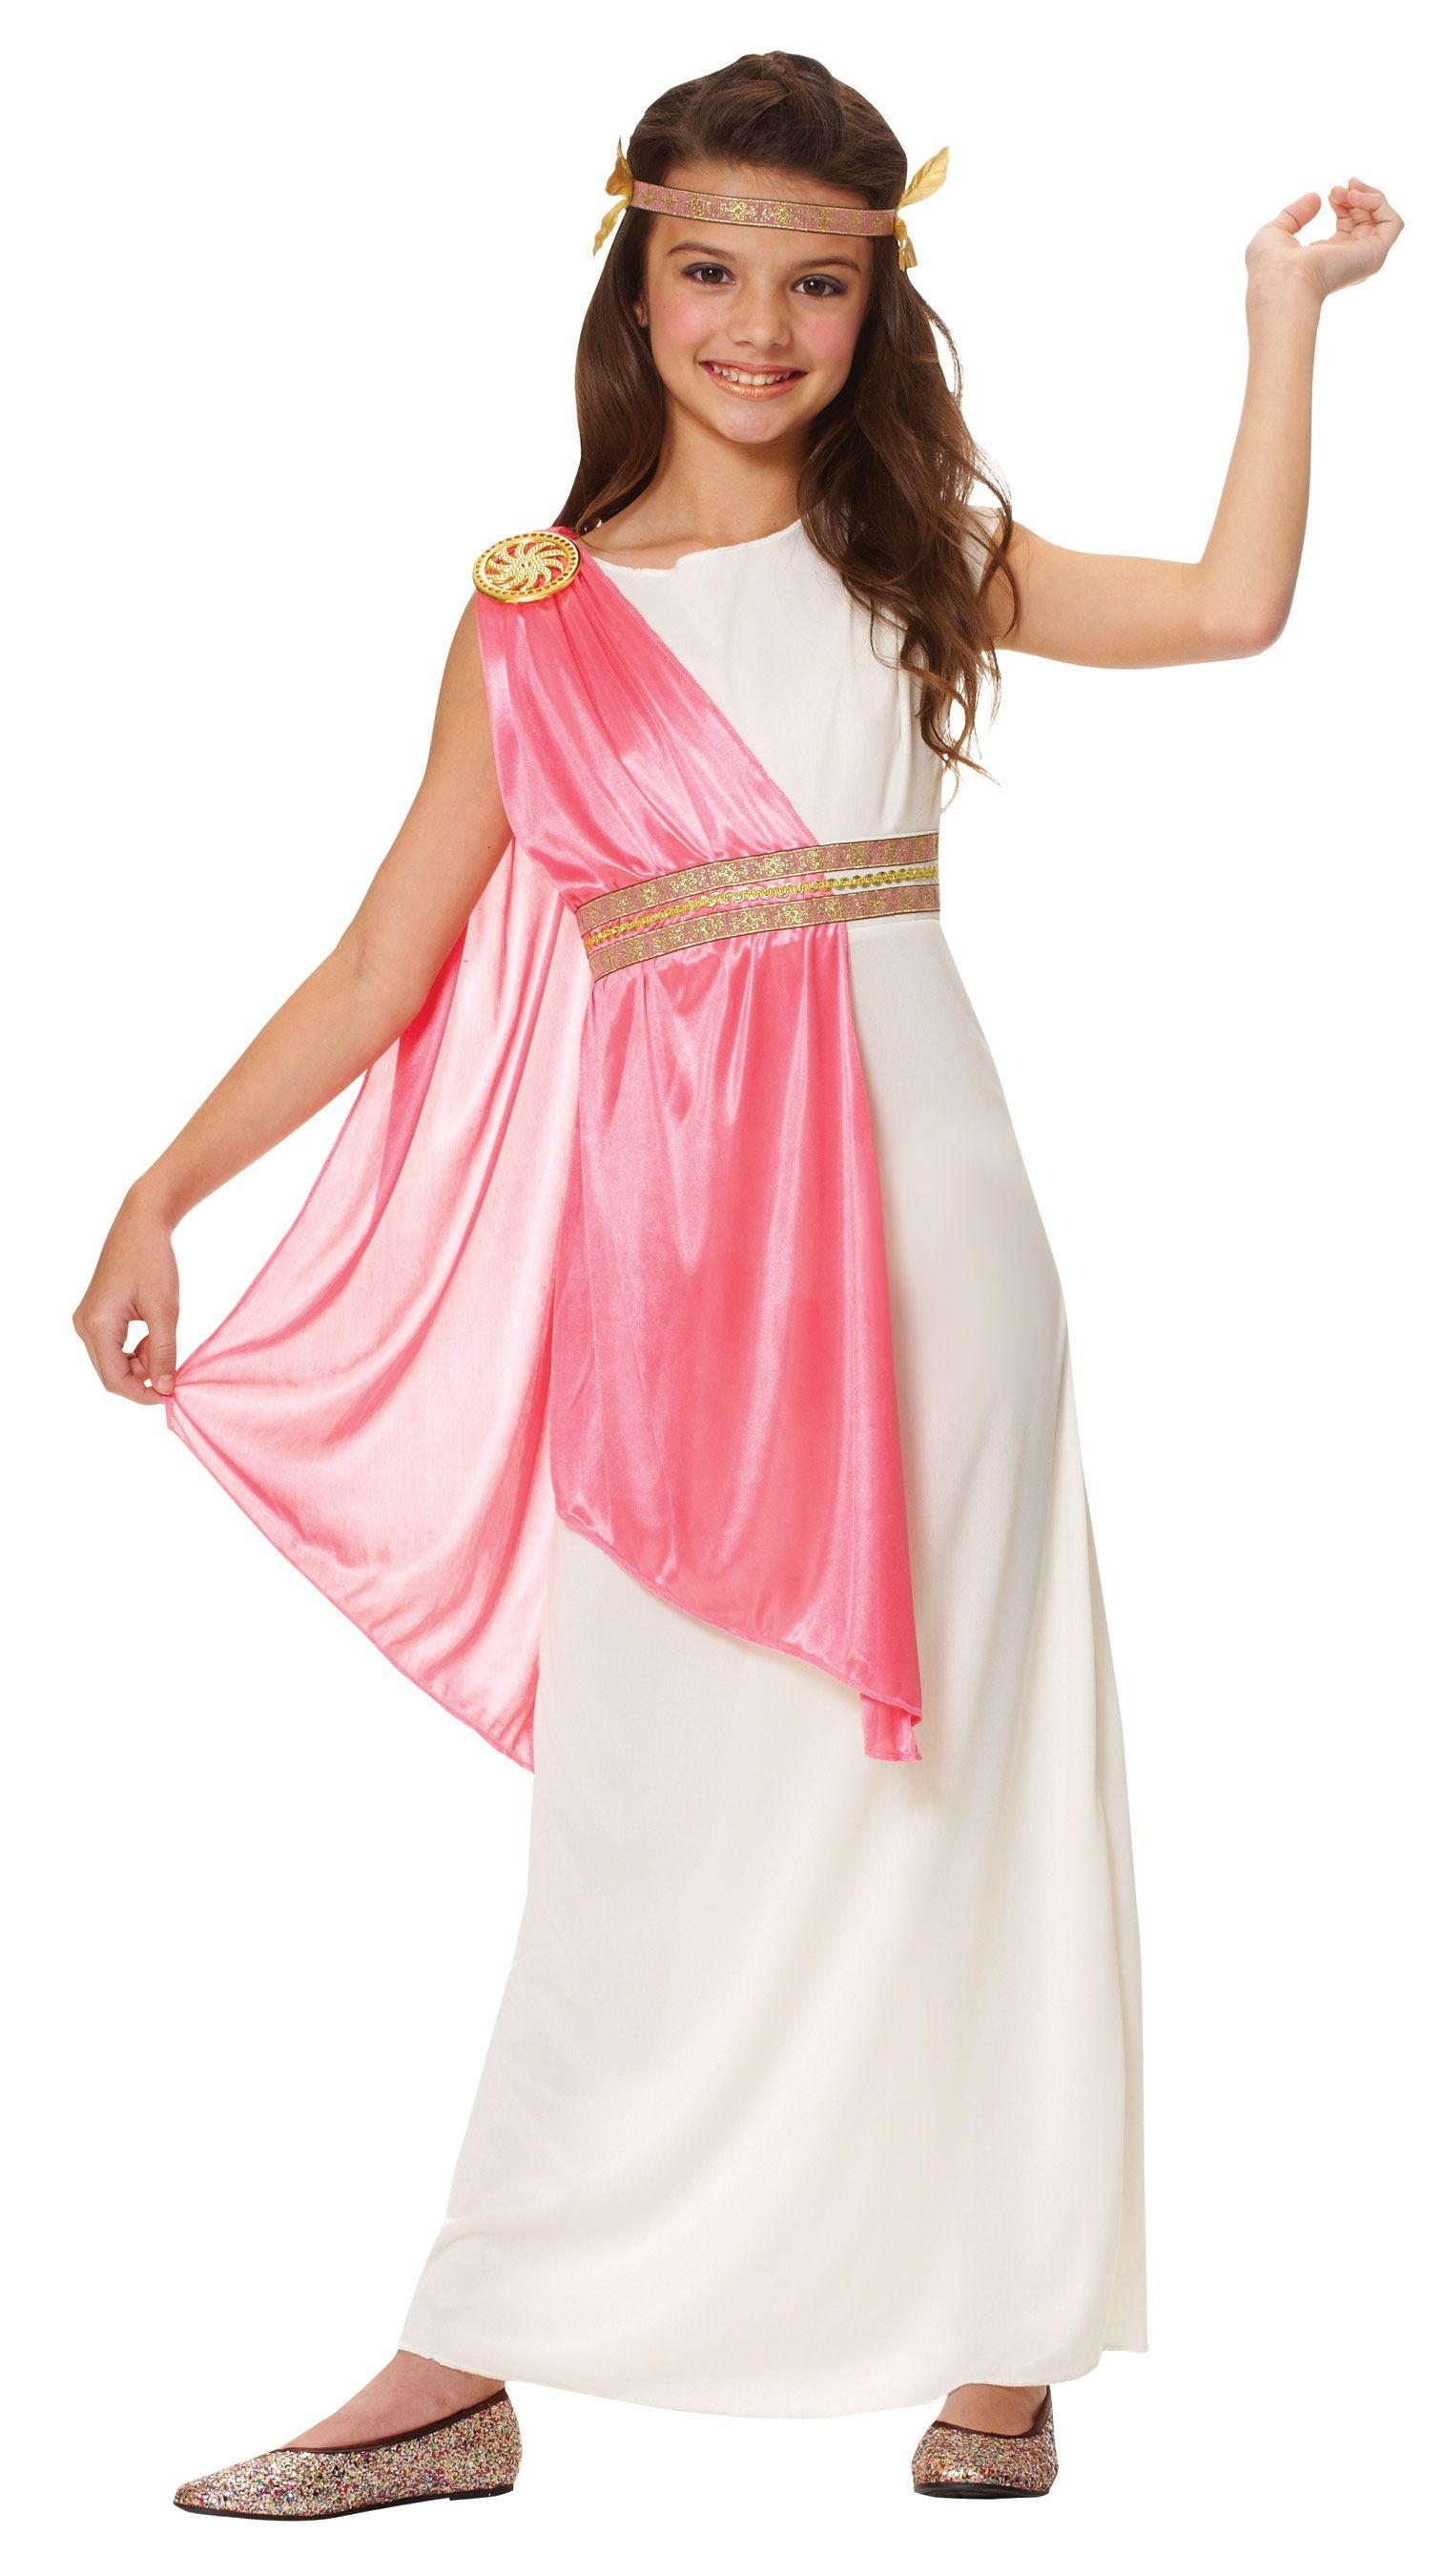 Lovely costume need it in Uk | Roman Day | Pinterest | Dizfraces ...